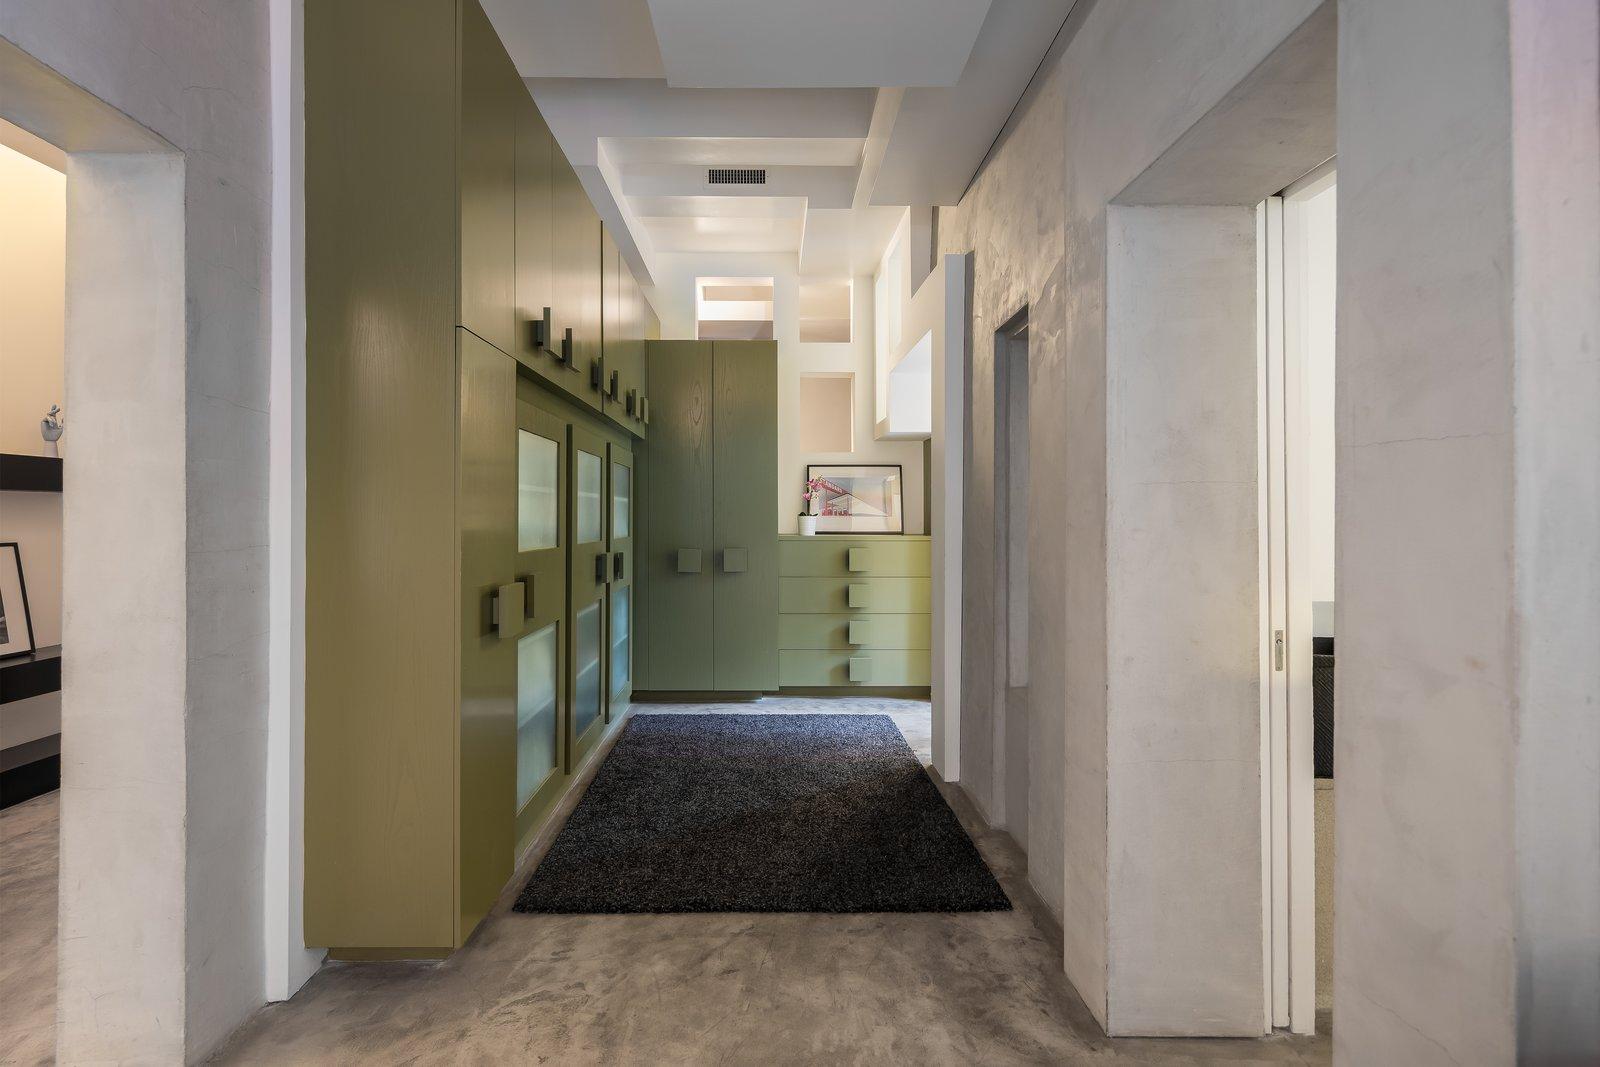 Samuel-Novarro House cabinetry